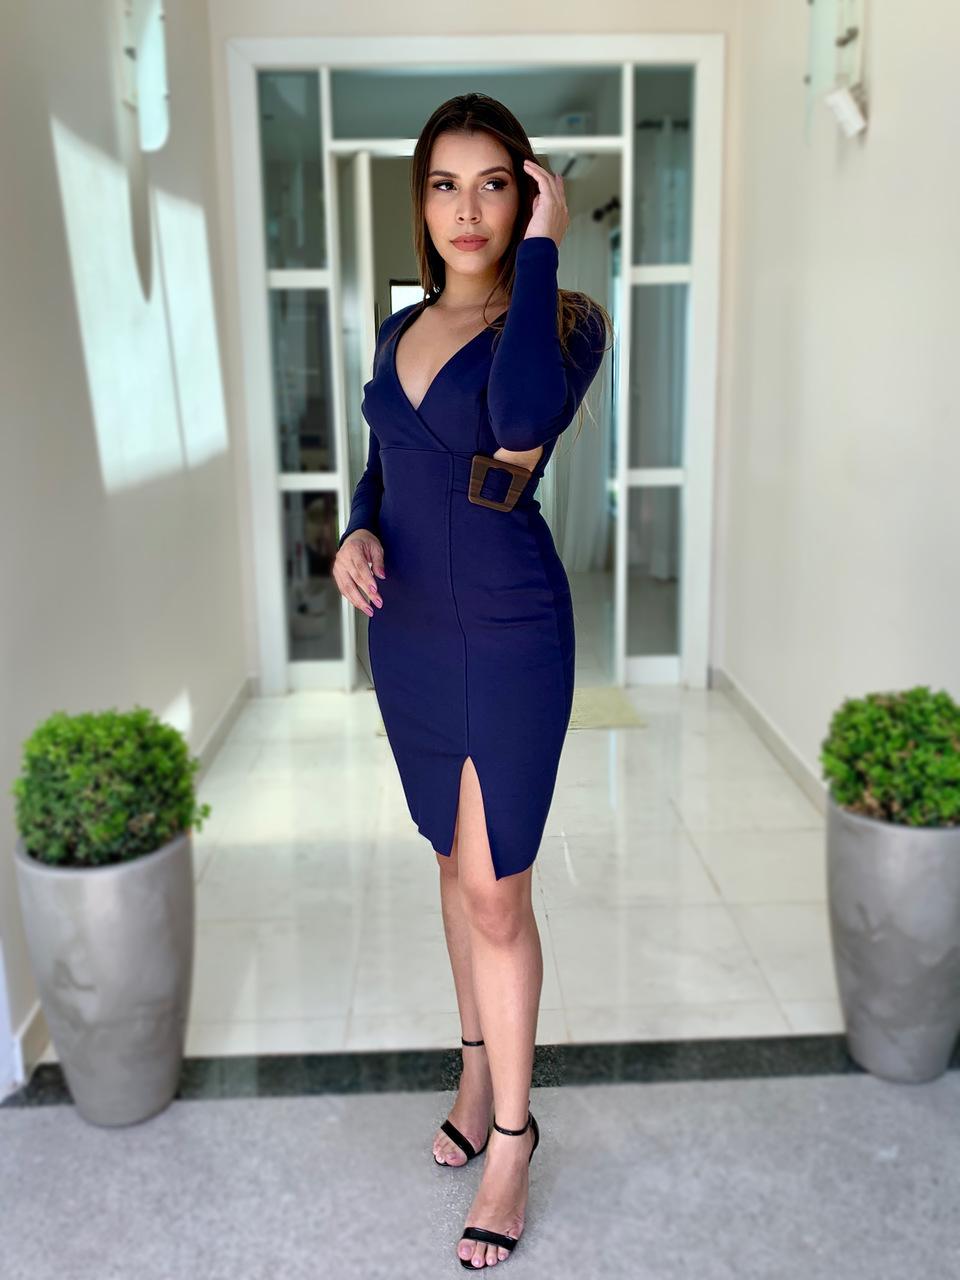 Vestido Curto Manga Longa Fivela Azul-Marinho P - Colcci